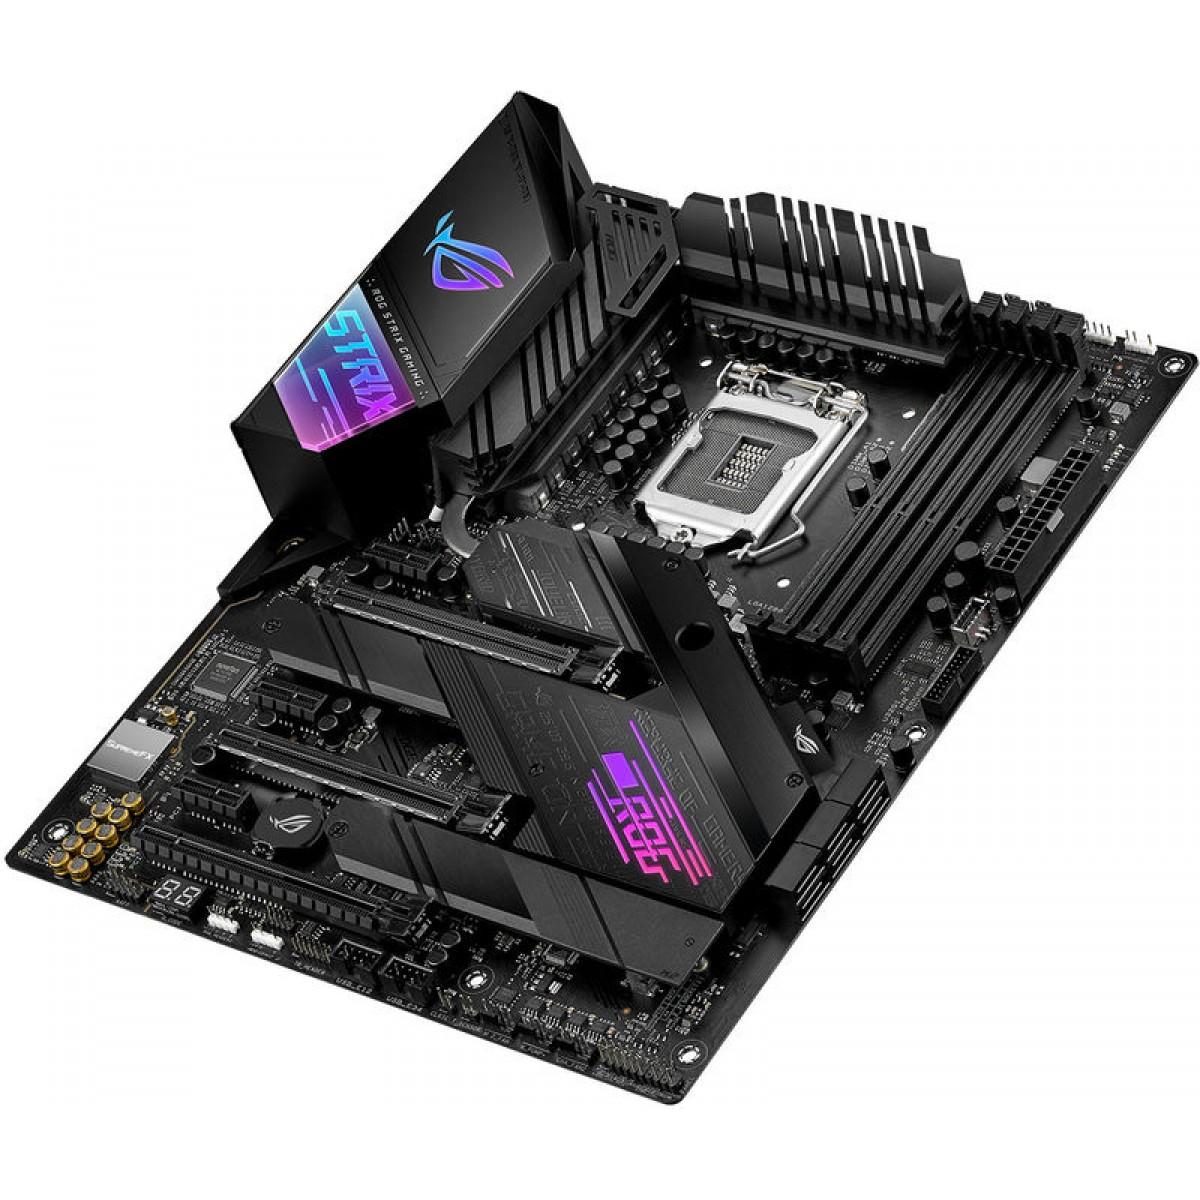 Placa Mãe Asus Rog Strix Z490-E Gaming Wi-Fi, Chipset Z490, Intel LGA 1200, ATX, DDR4